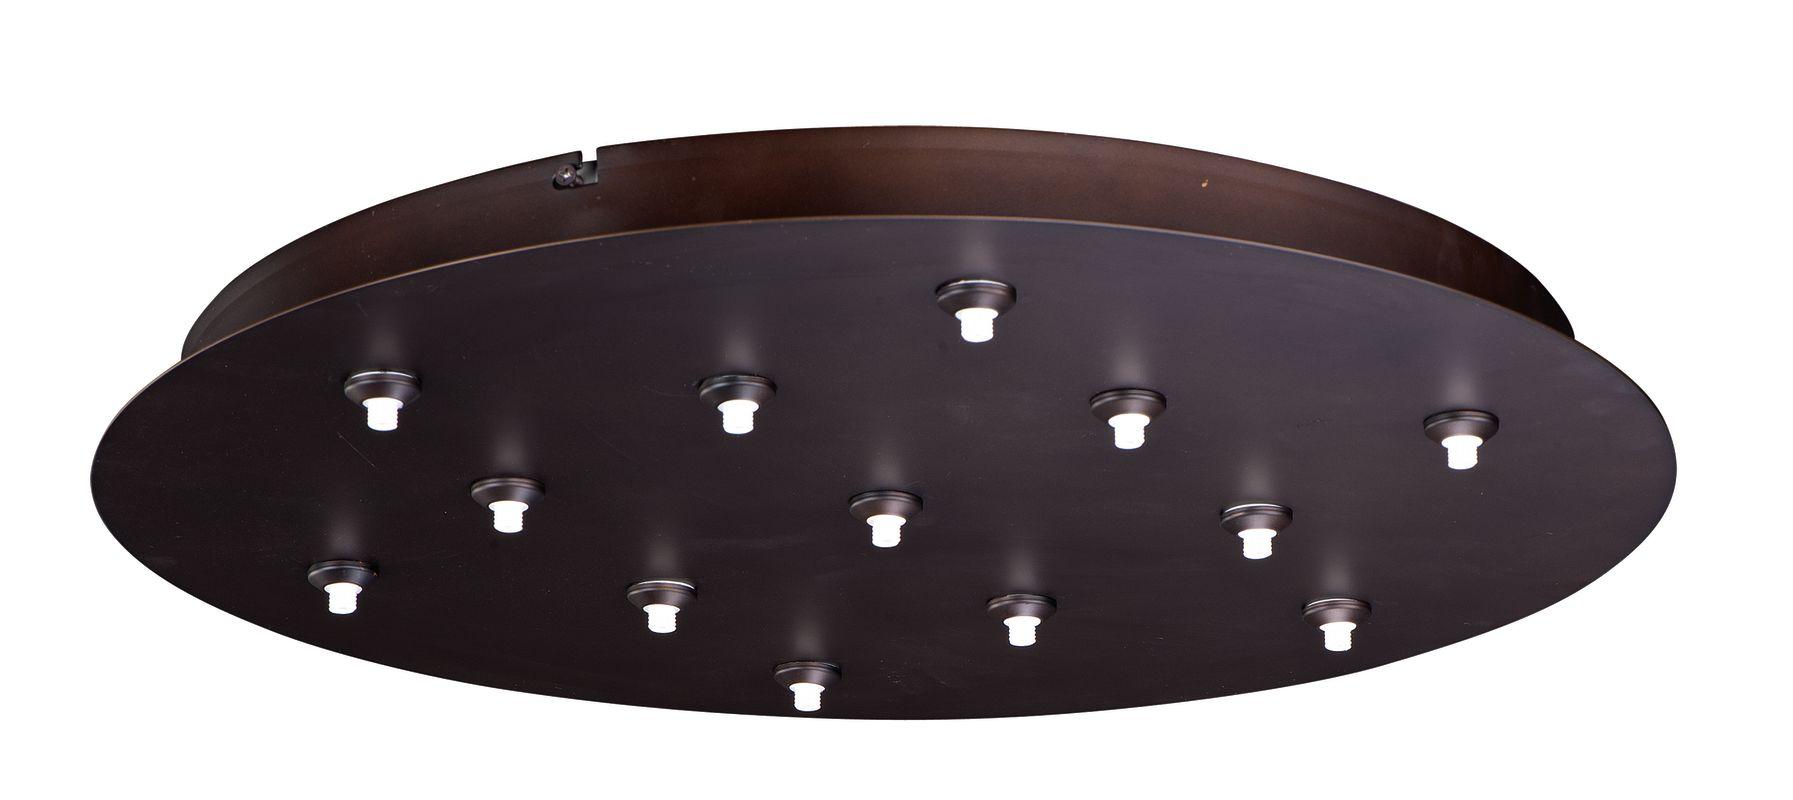 ET2 EC95022 RapidJack 13 Light Canopy Bronze Accessory Canopies Sale $698.00 ITEM: bci2558332 ID#:EC95022-BZ UPC: 845094071273 :